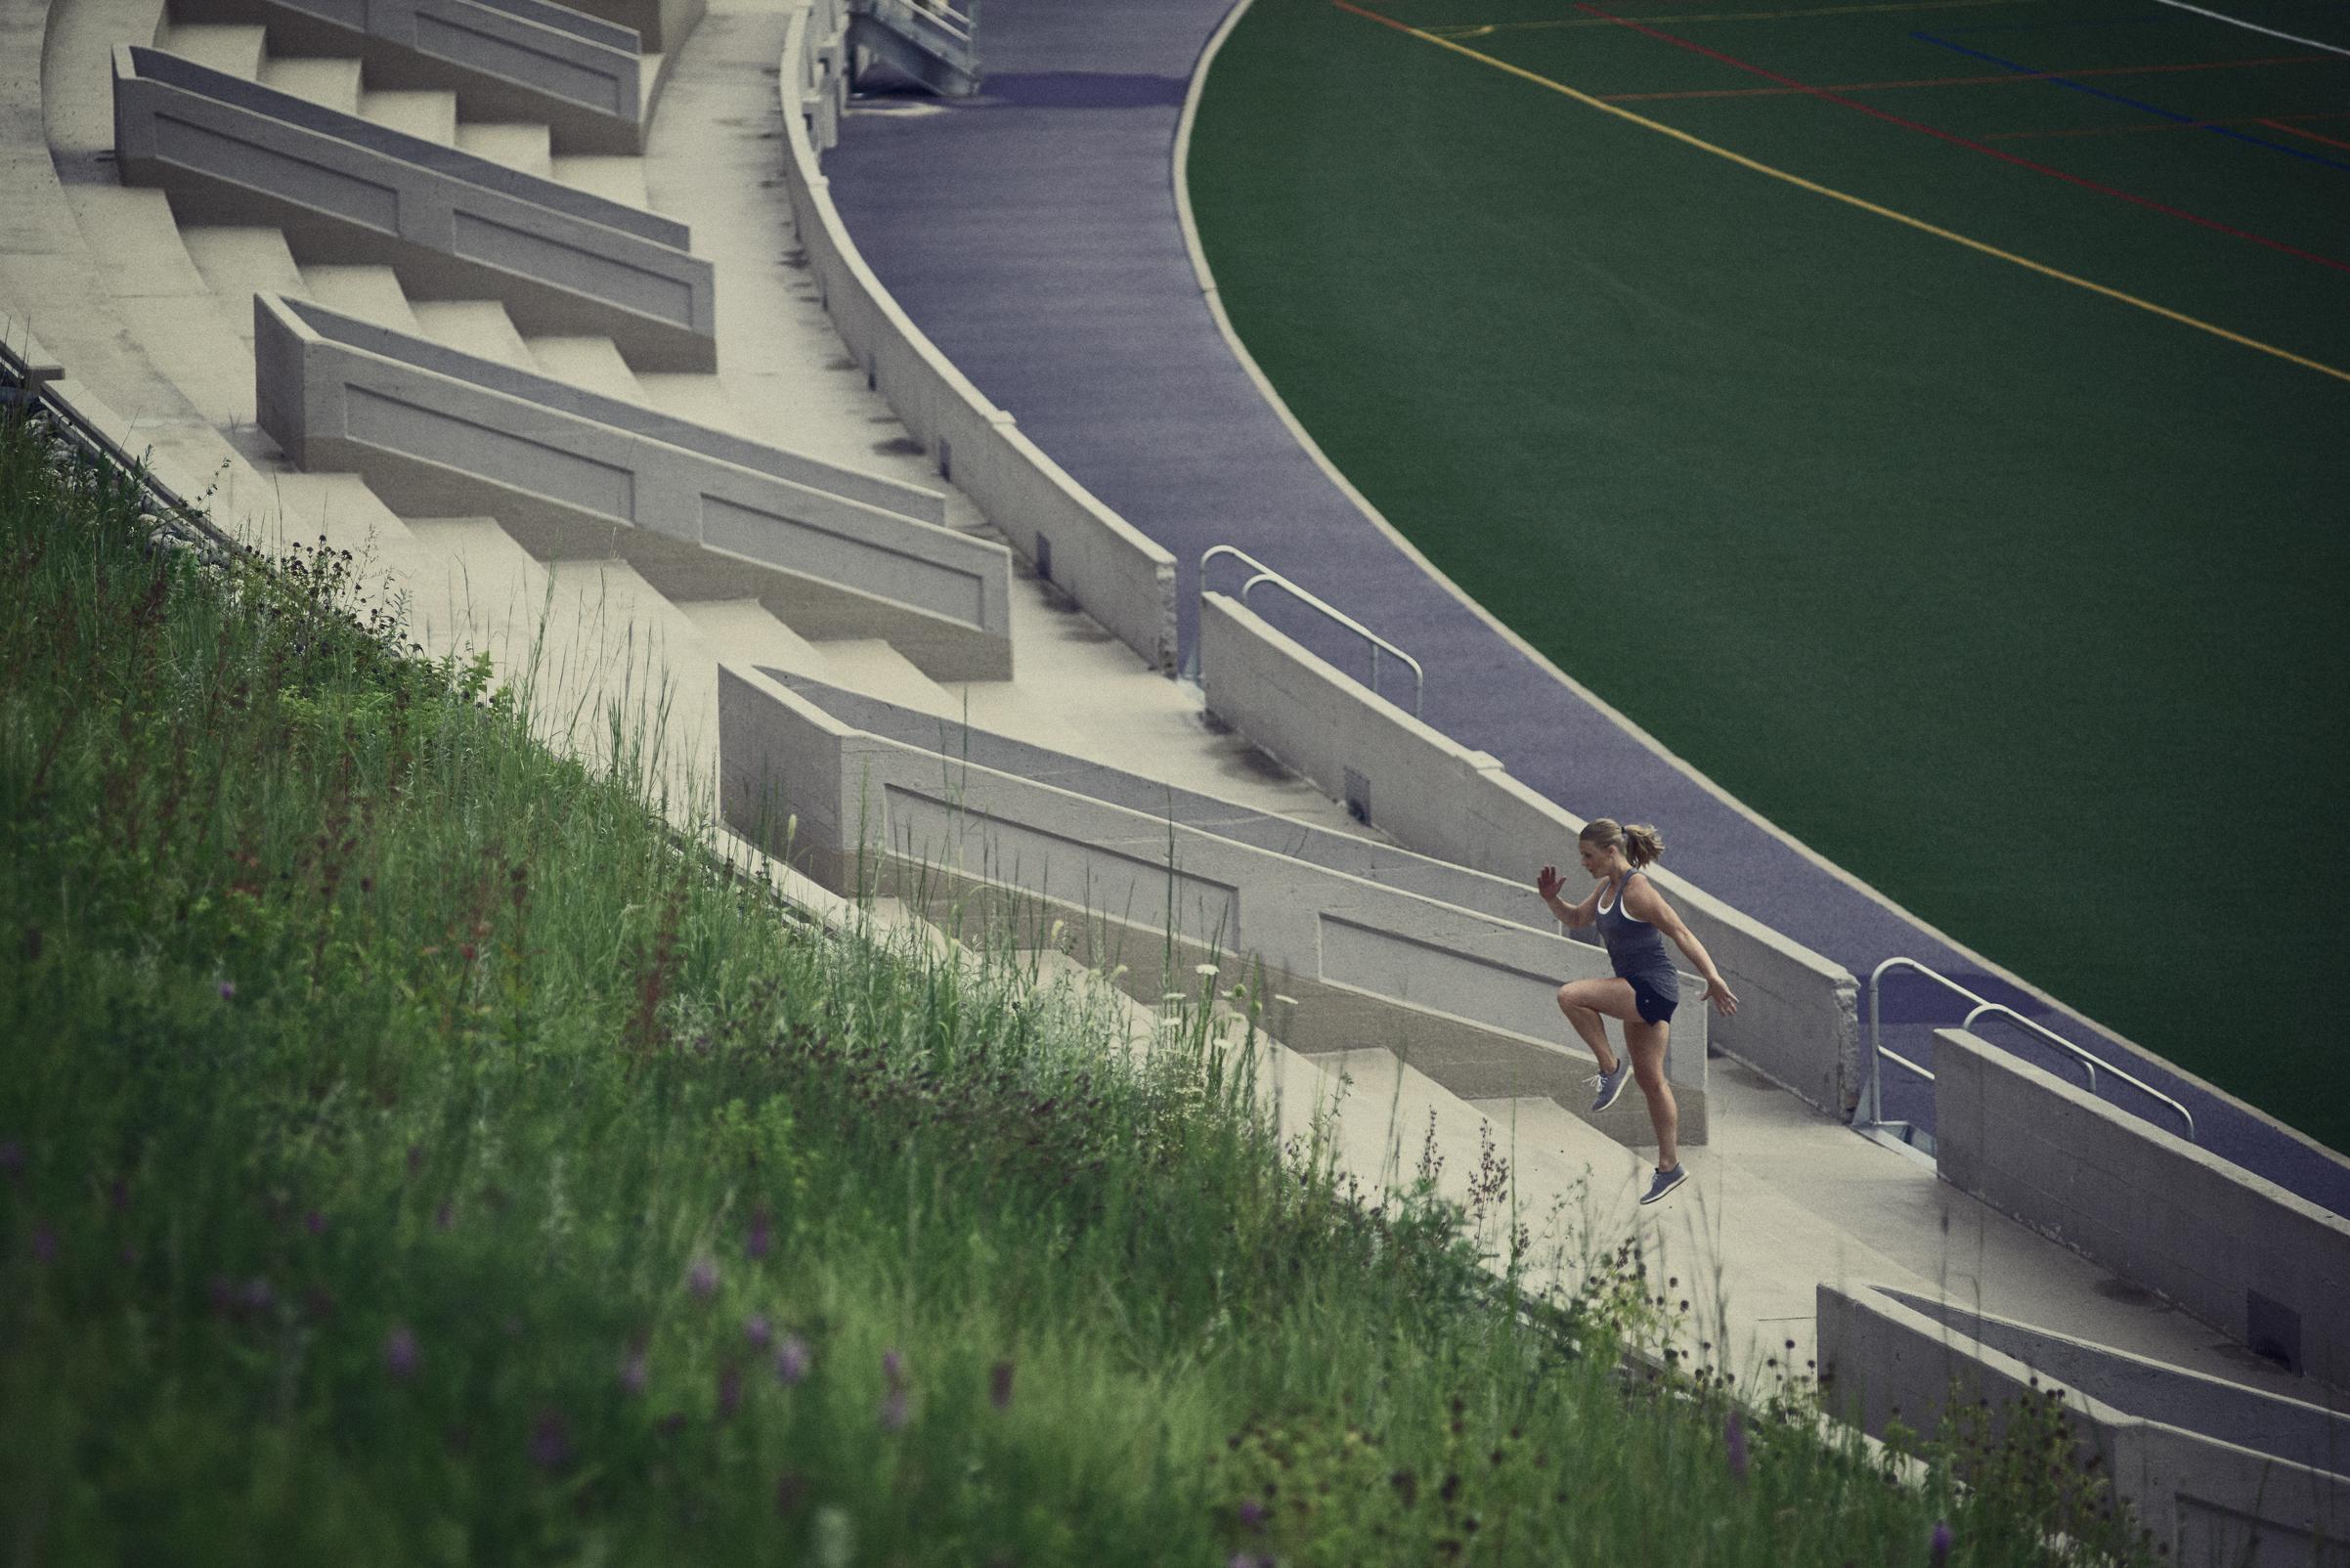 Ainslie Kehler, lululemon ambassador photographed by Craig Mulcahy for lululemon athletica in Kansas City, Missouri.